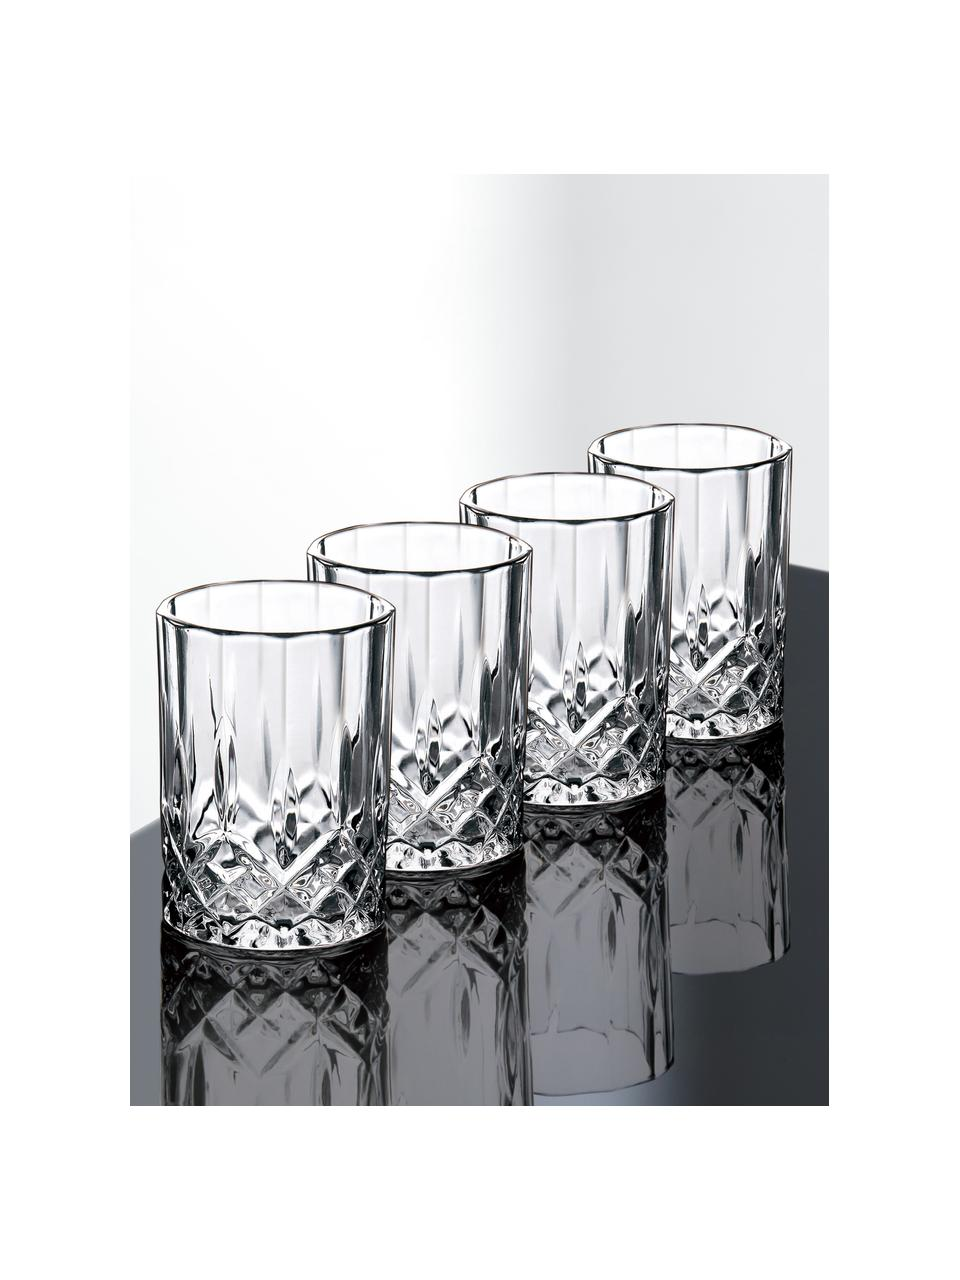 Bicchieri con motivo in rilievo Harvey 4 pz, Vetro, Trasparente, Ø 4 x Alt. 6 cm